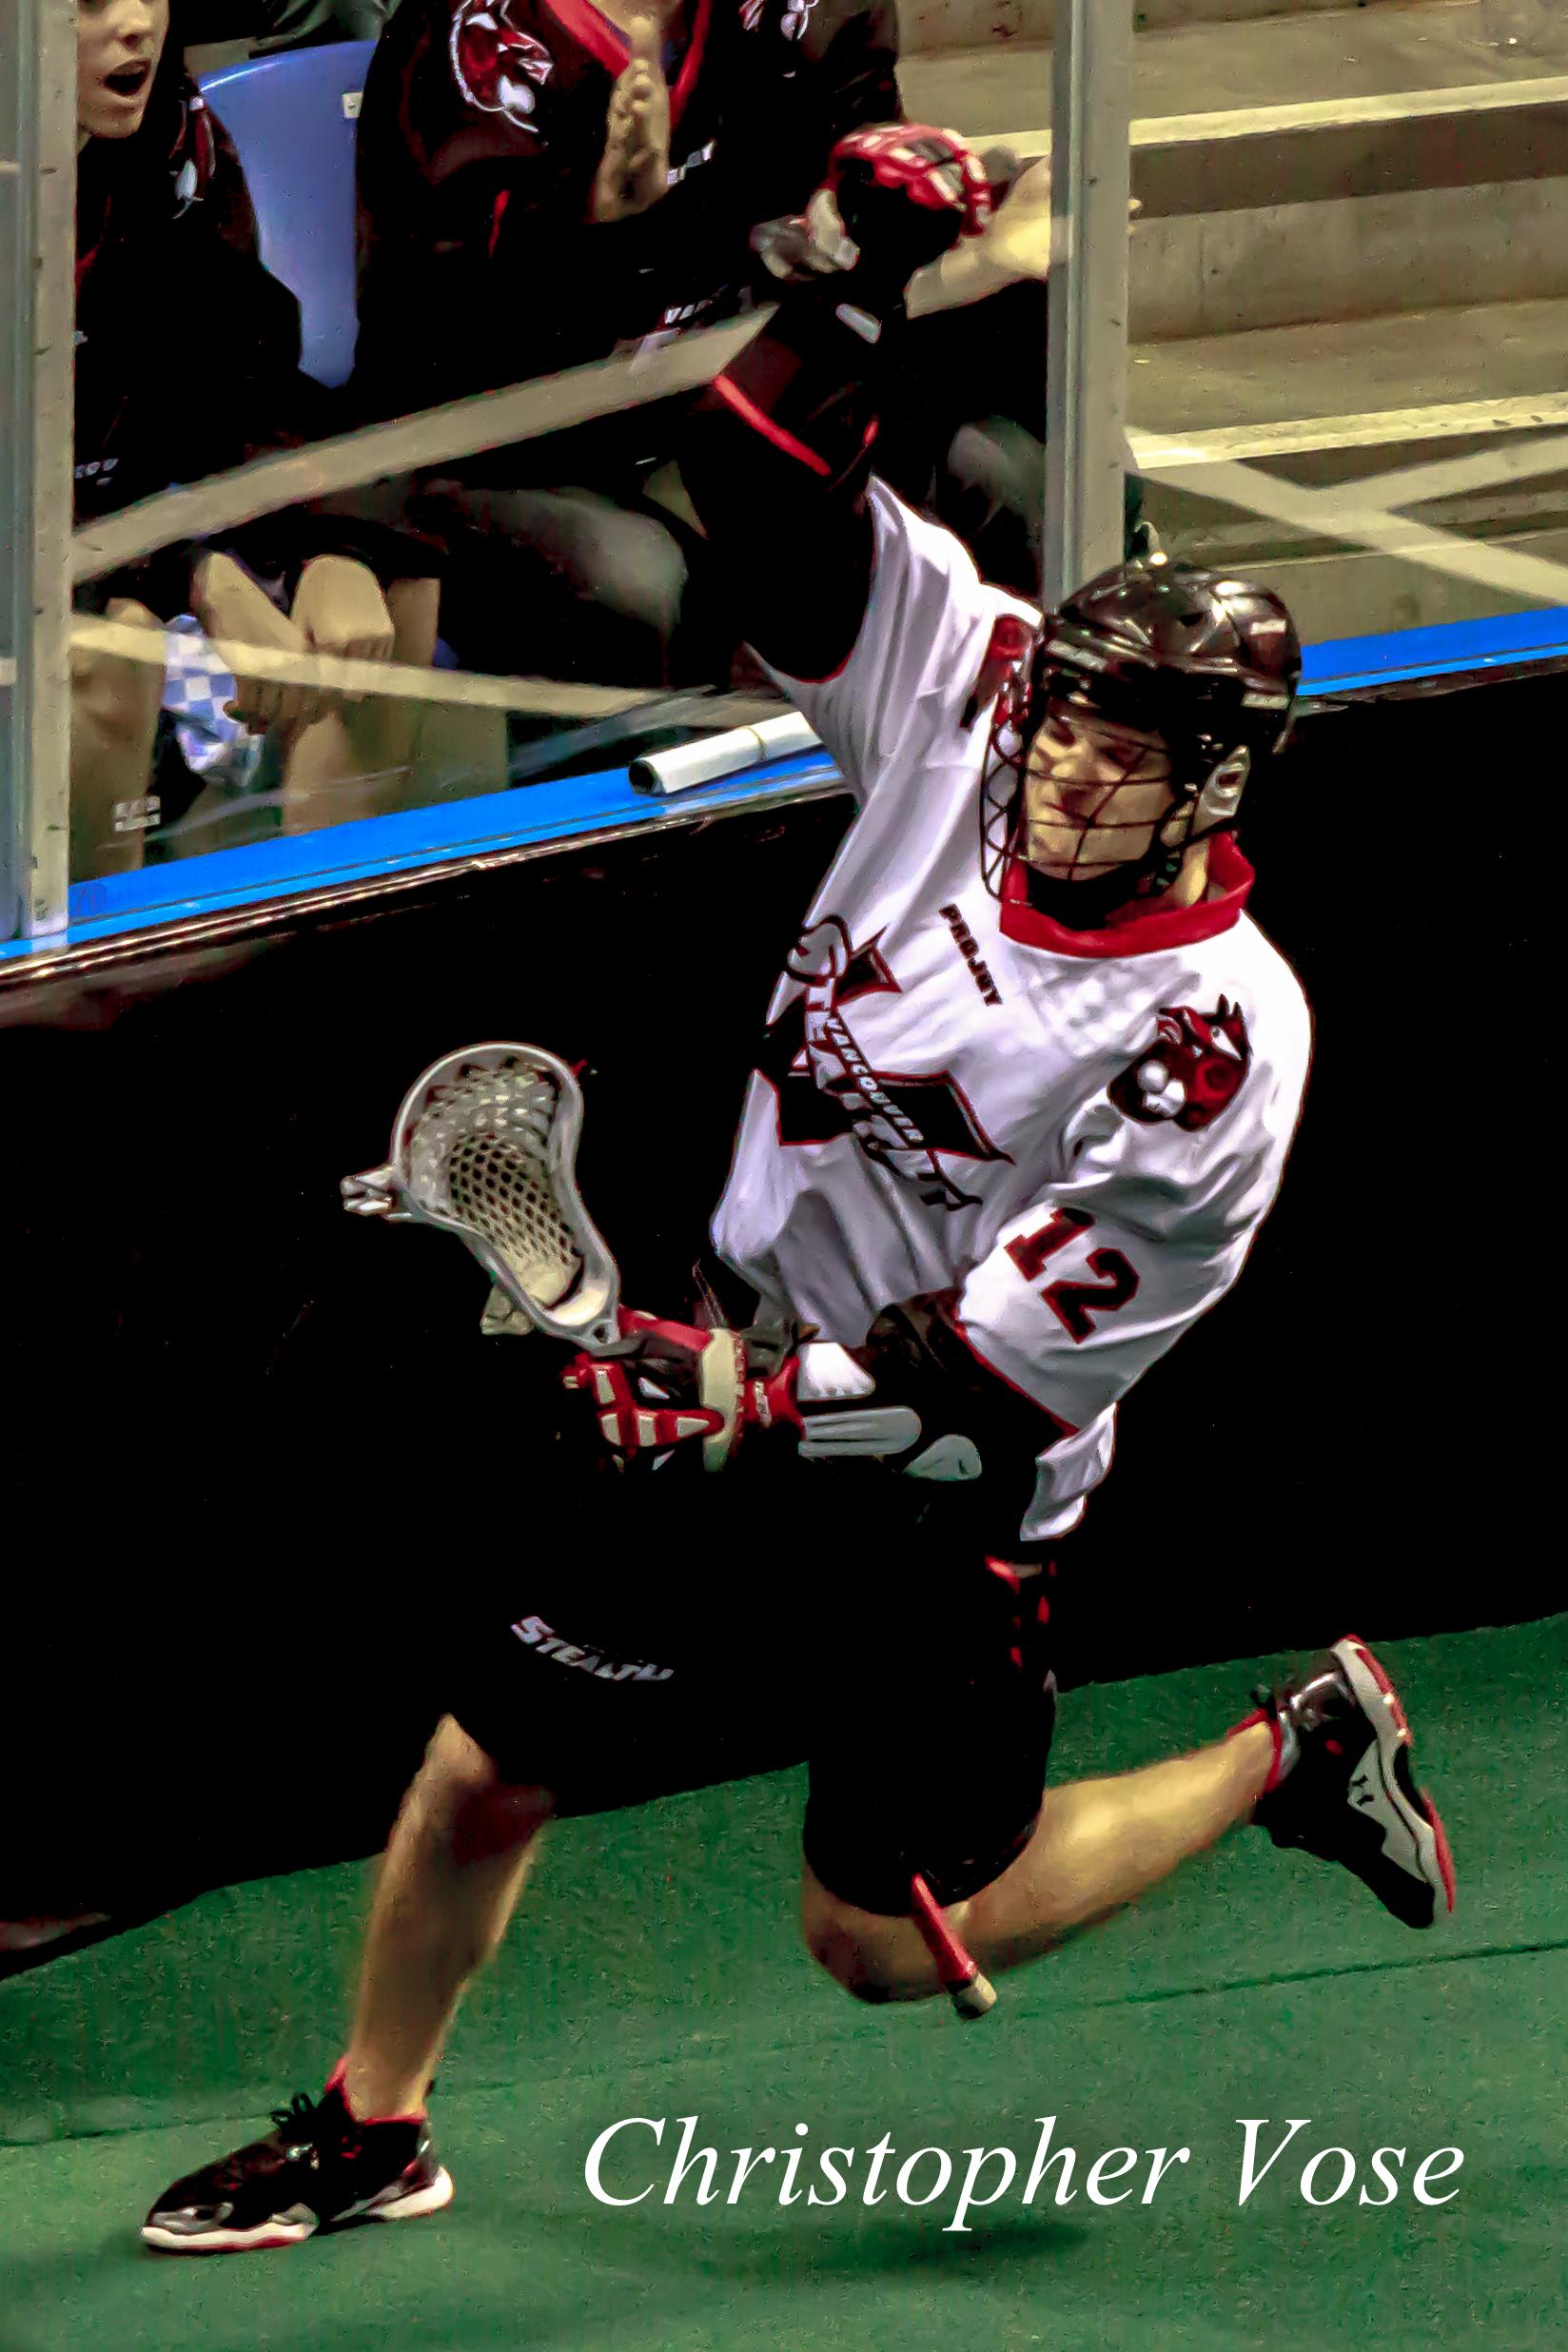 2014-01-17 Cody Bremner's Third Goal Celebration.jpg